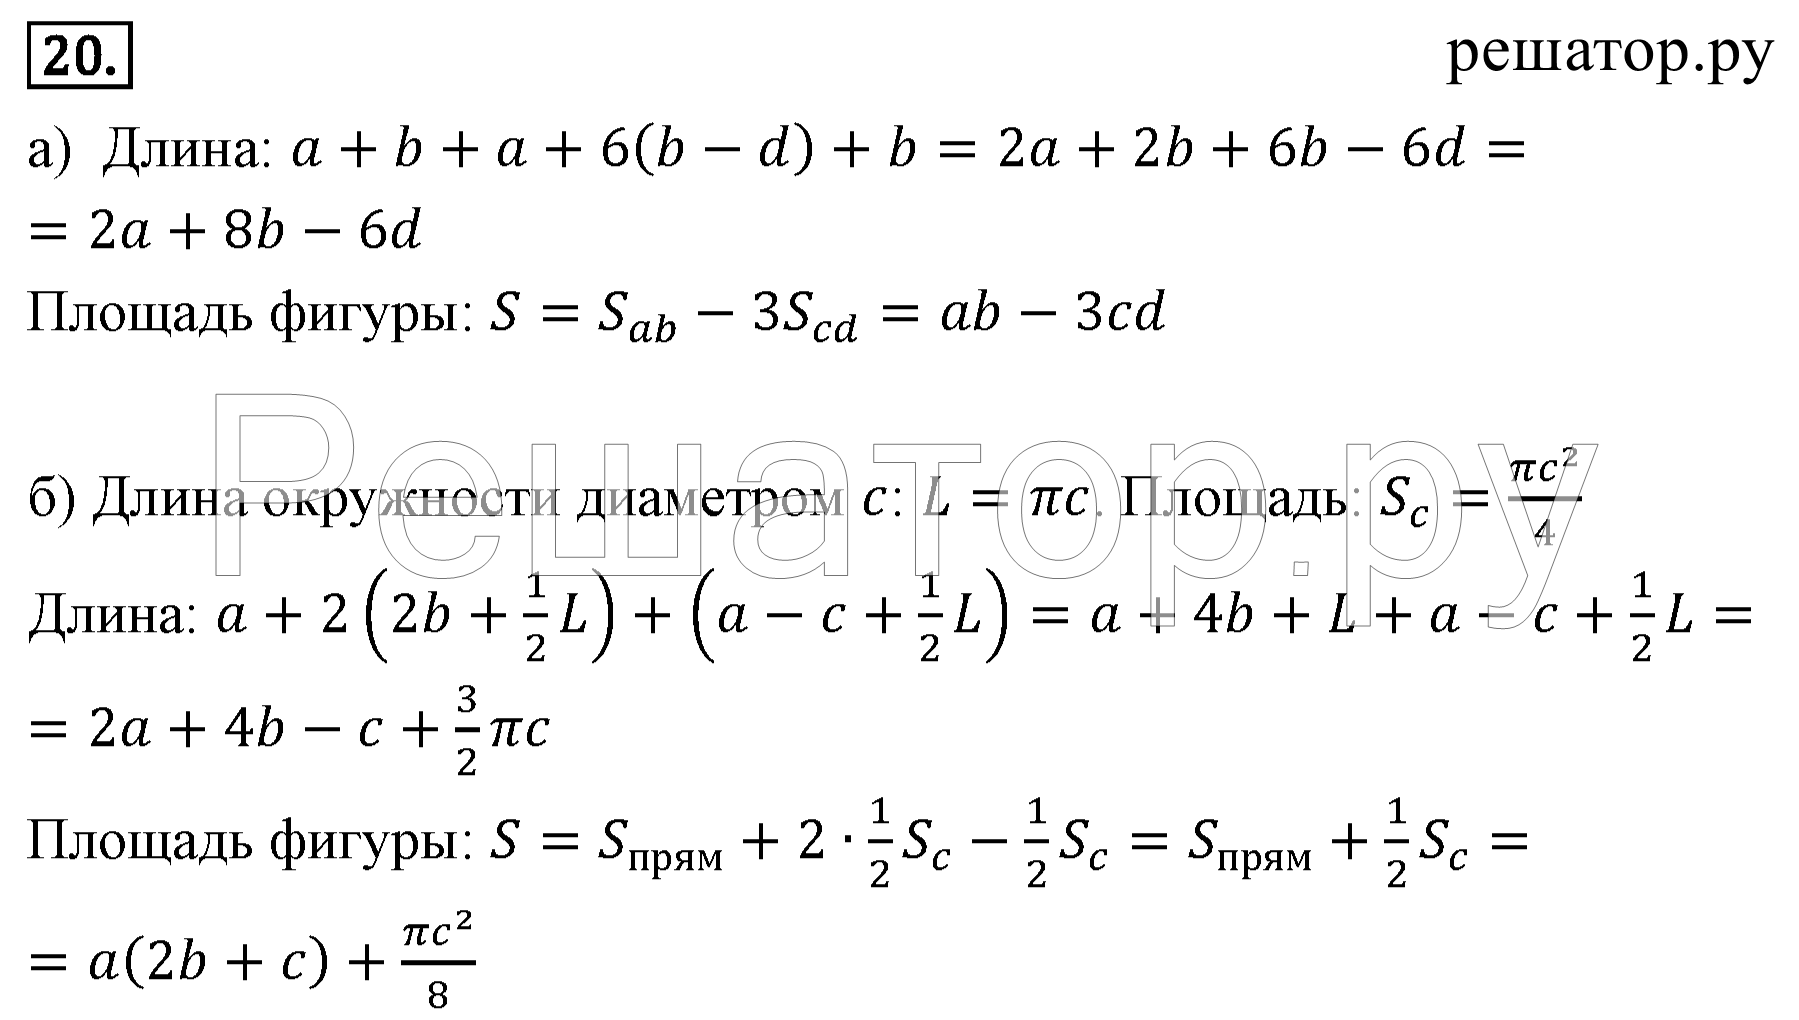 алгебра мерзляк гимназия 7 класс решебник